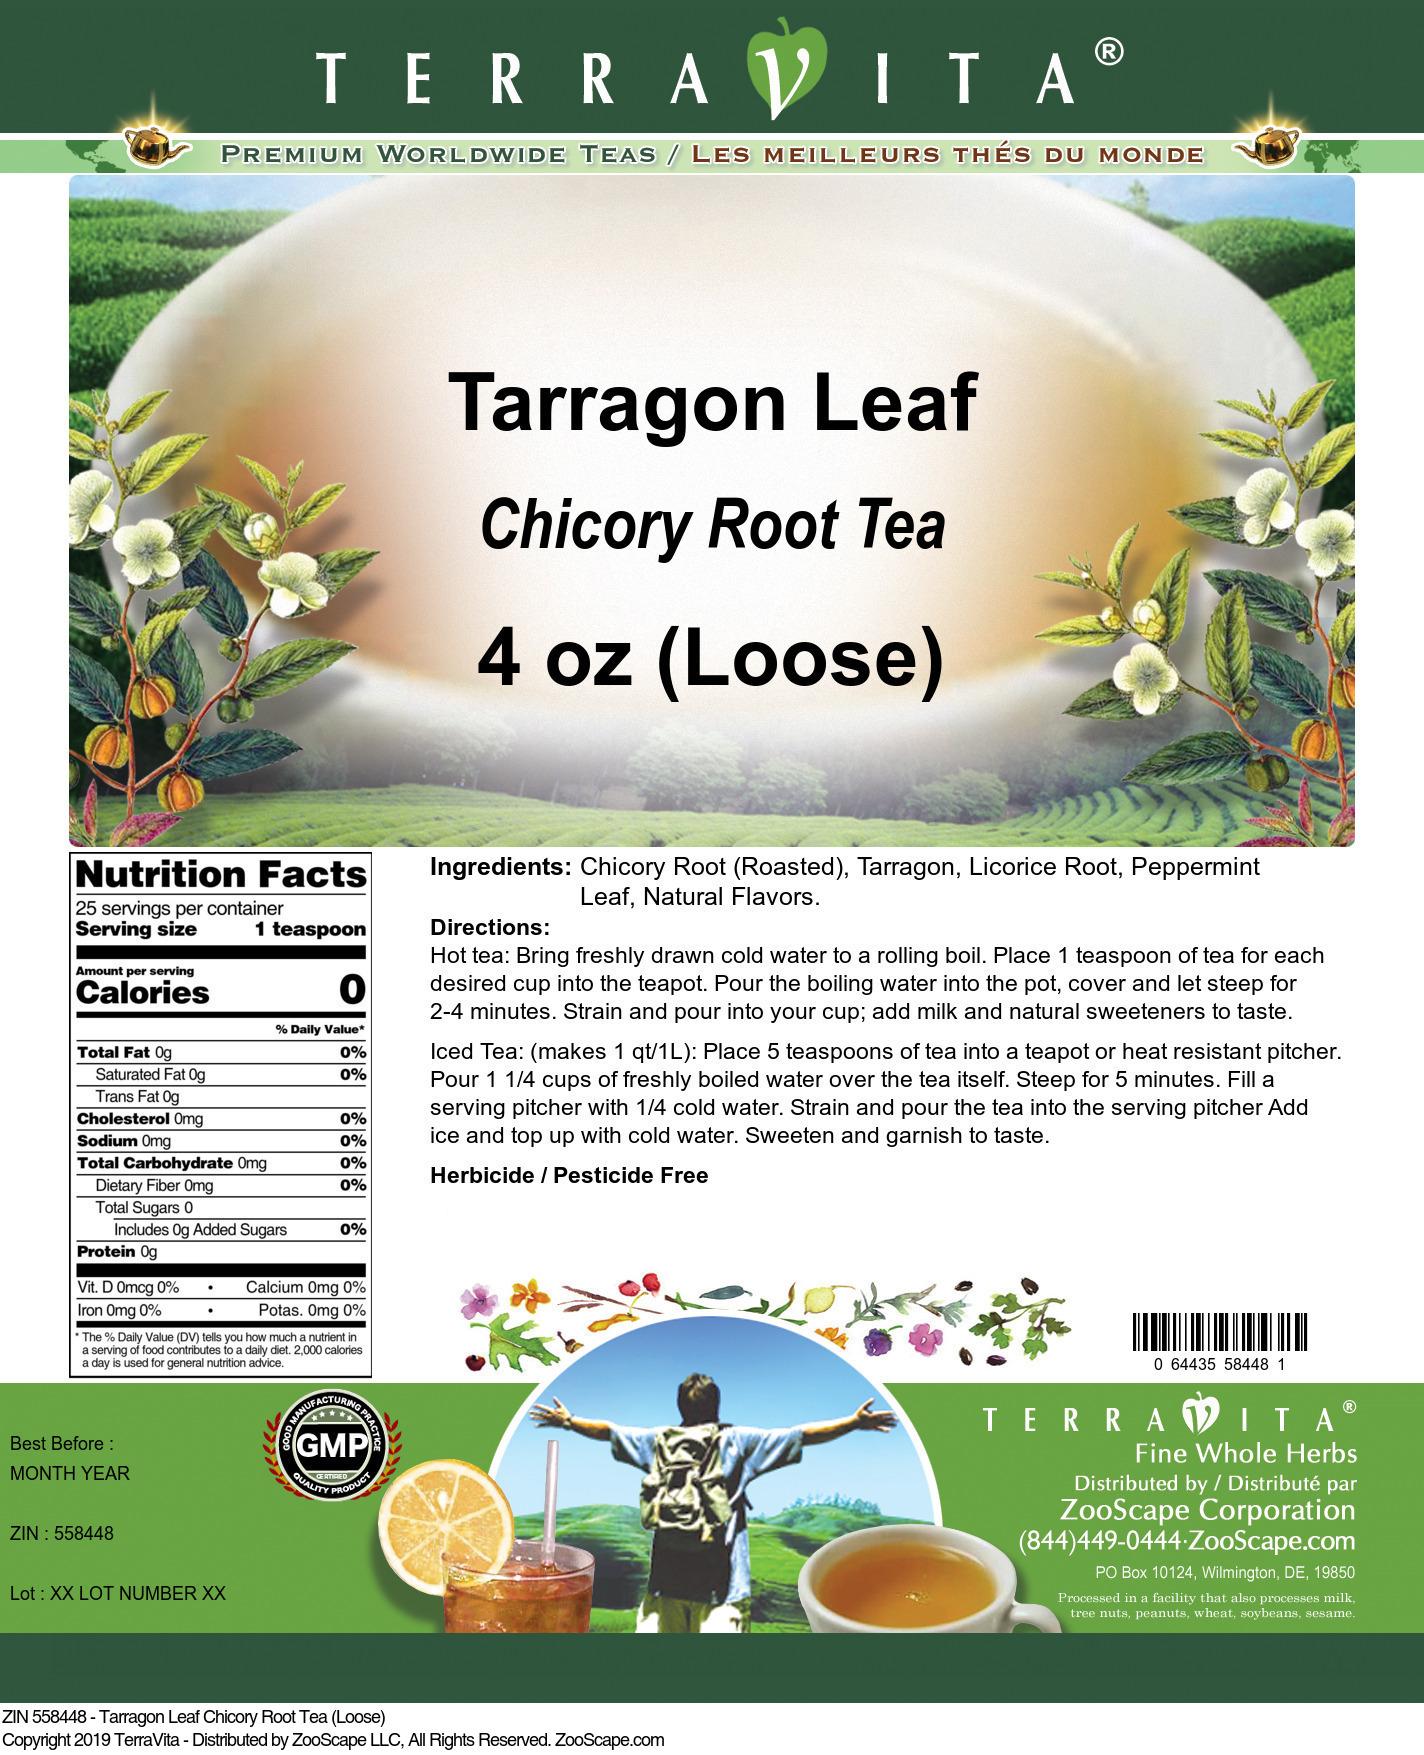 Tarragon Leaf Chicory Root